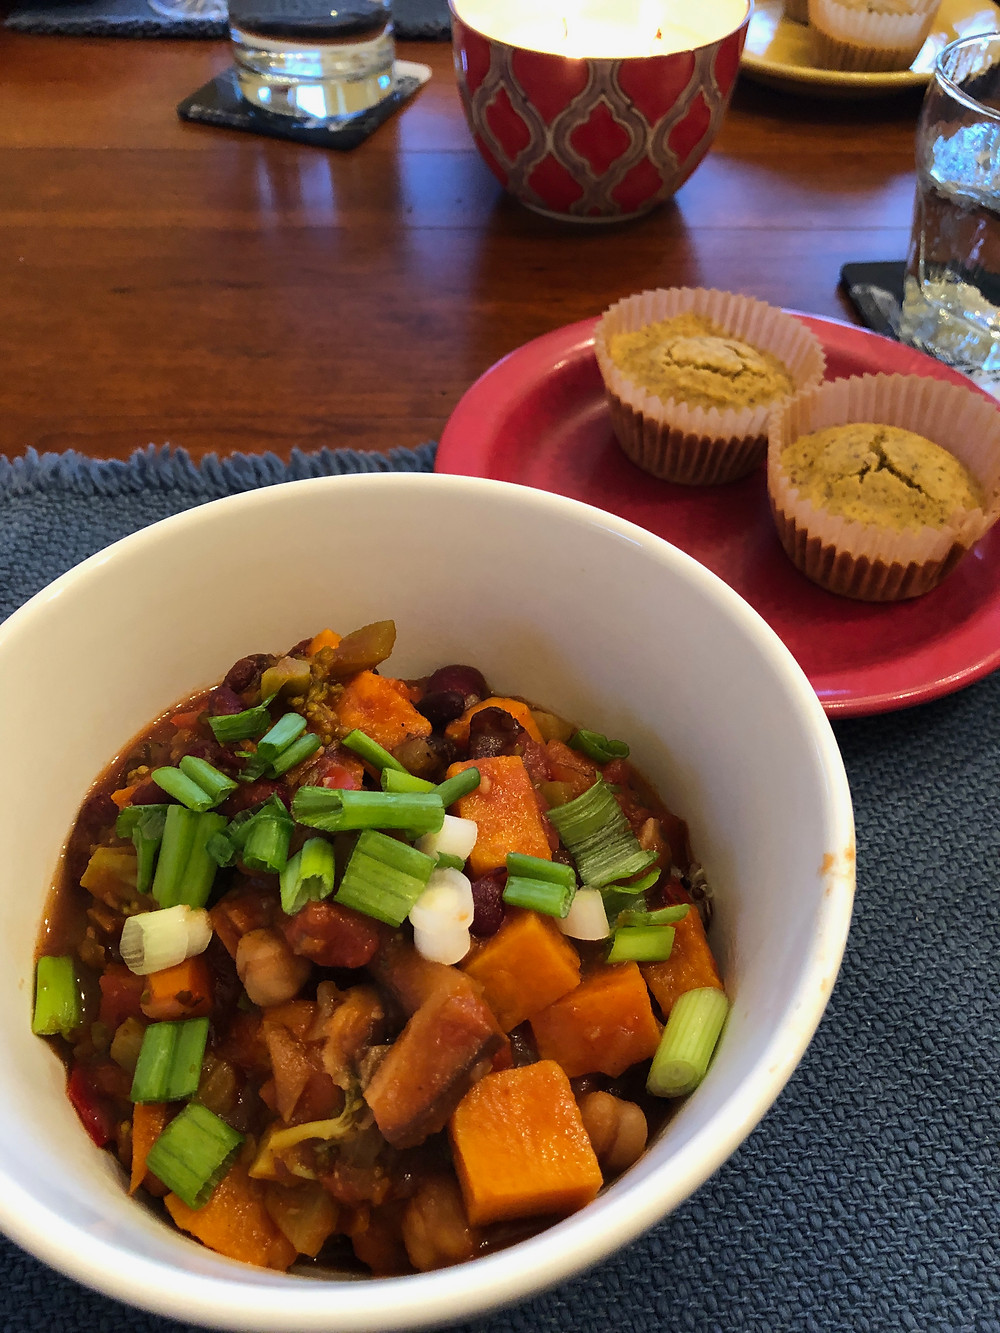 Plant-based Sweet Potato Chili with Cornbread Muffins